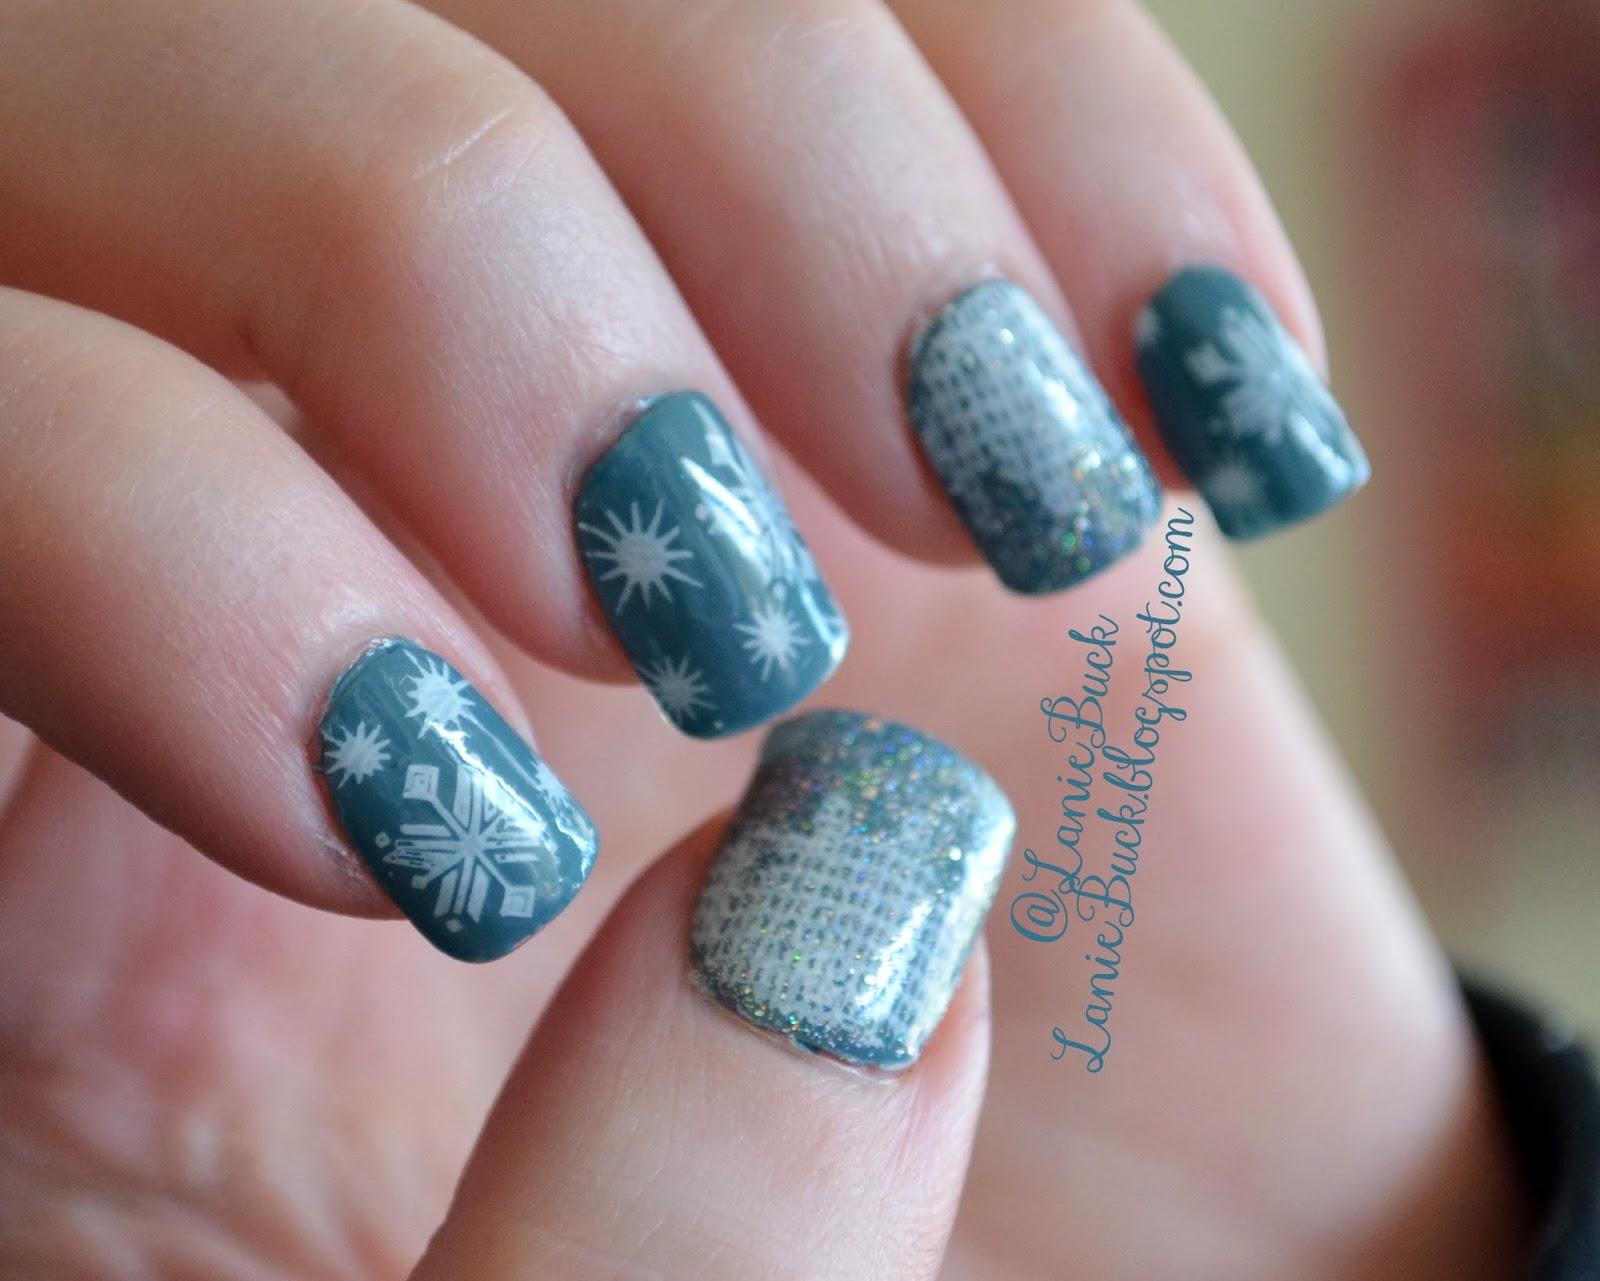 Diy Beauty Snowflake Nail Art Tutorial